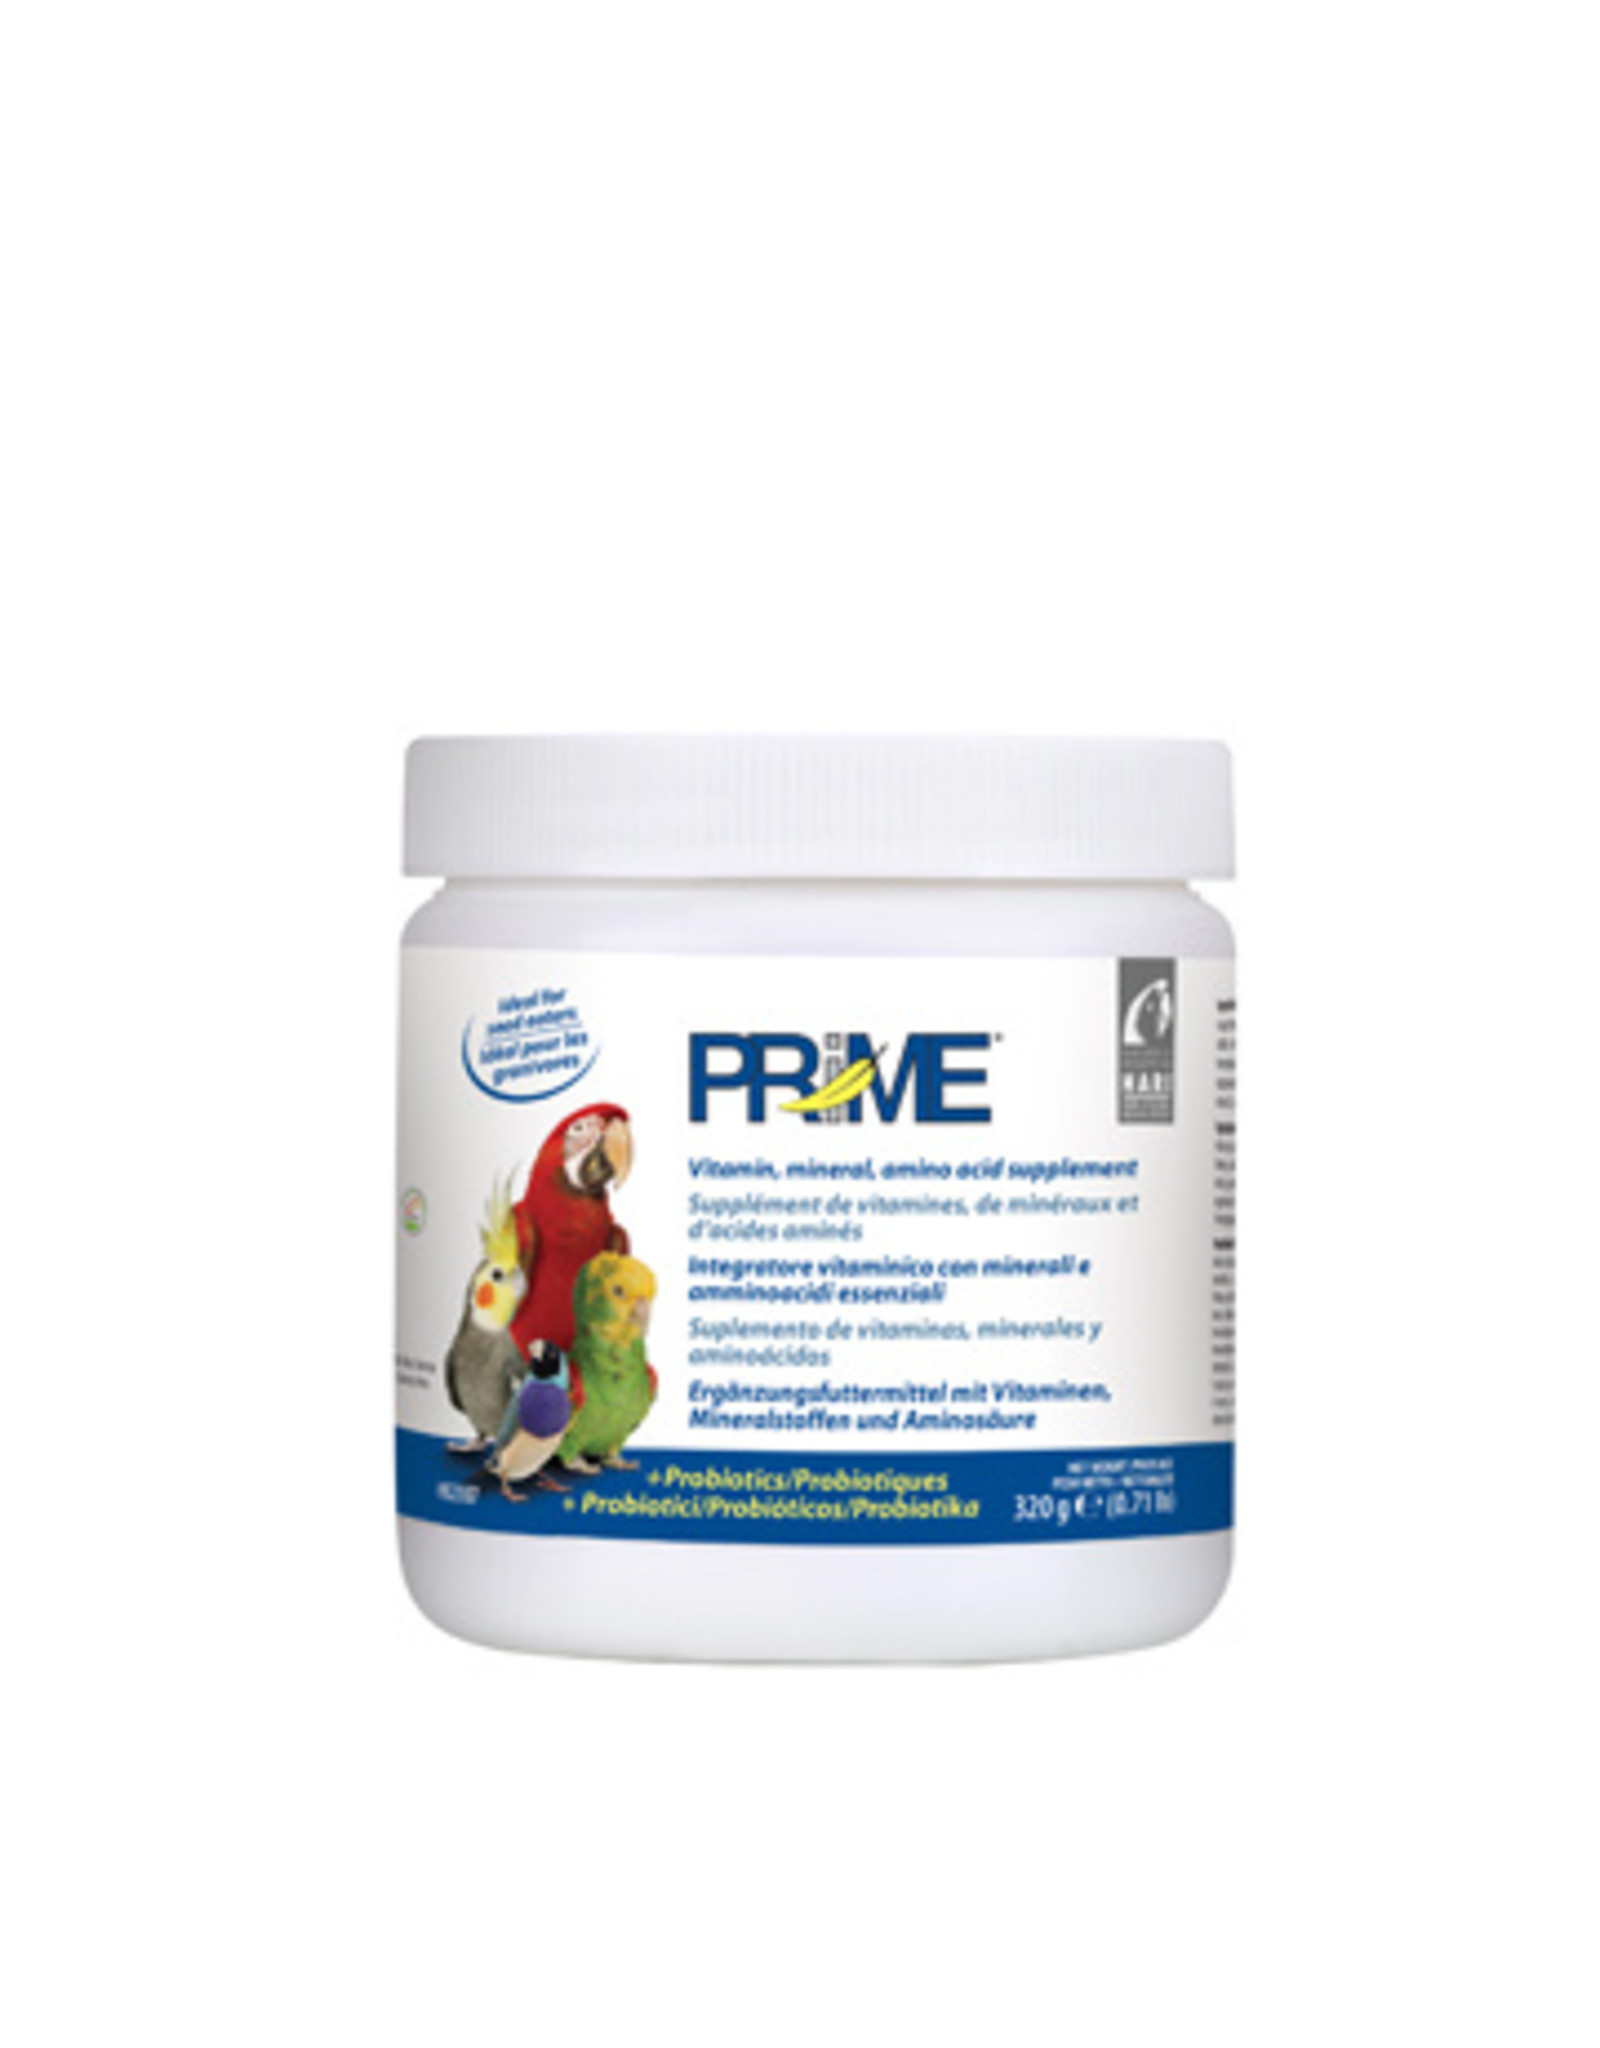 HG - Hagen Prime Vitamin Supplement